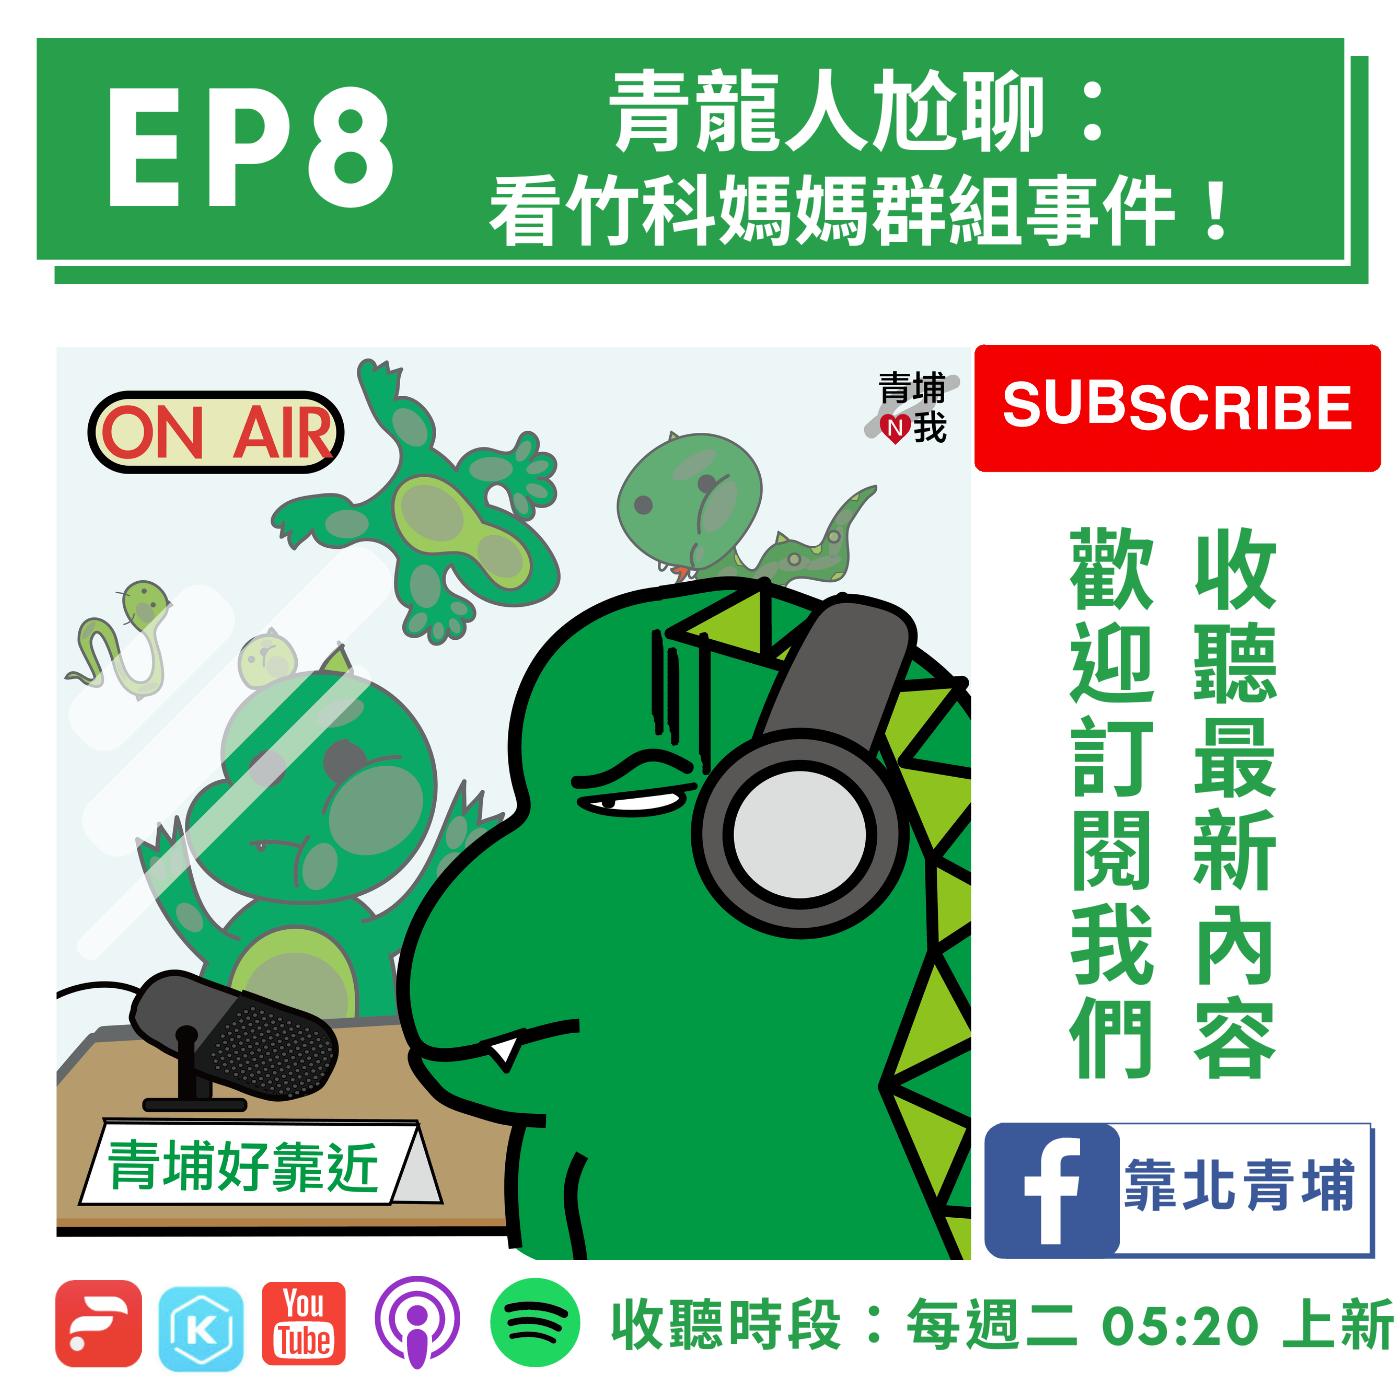 S1 EP8 - 青龍人尬聊:看竹科媽媽群組事件!